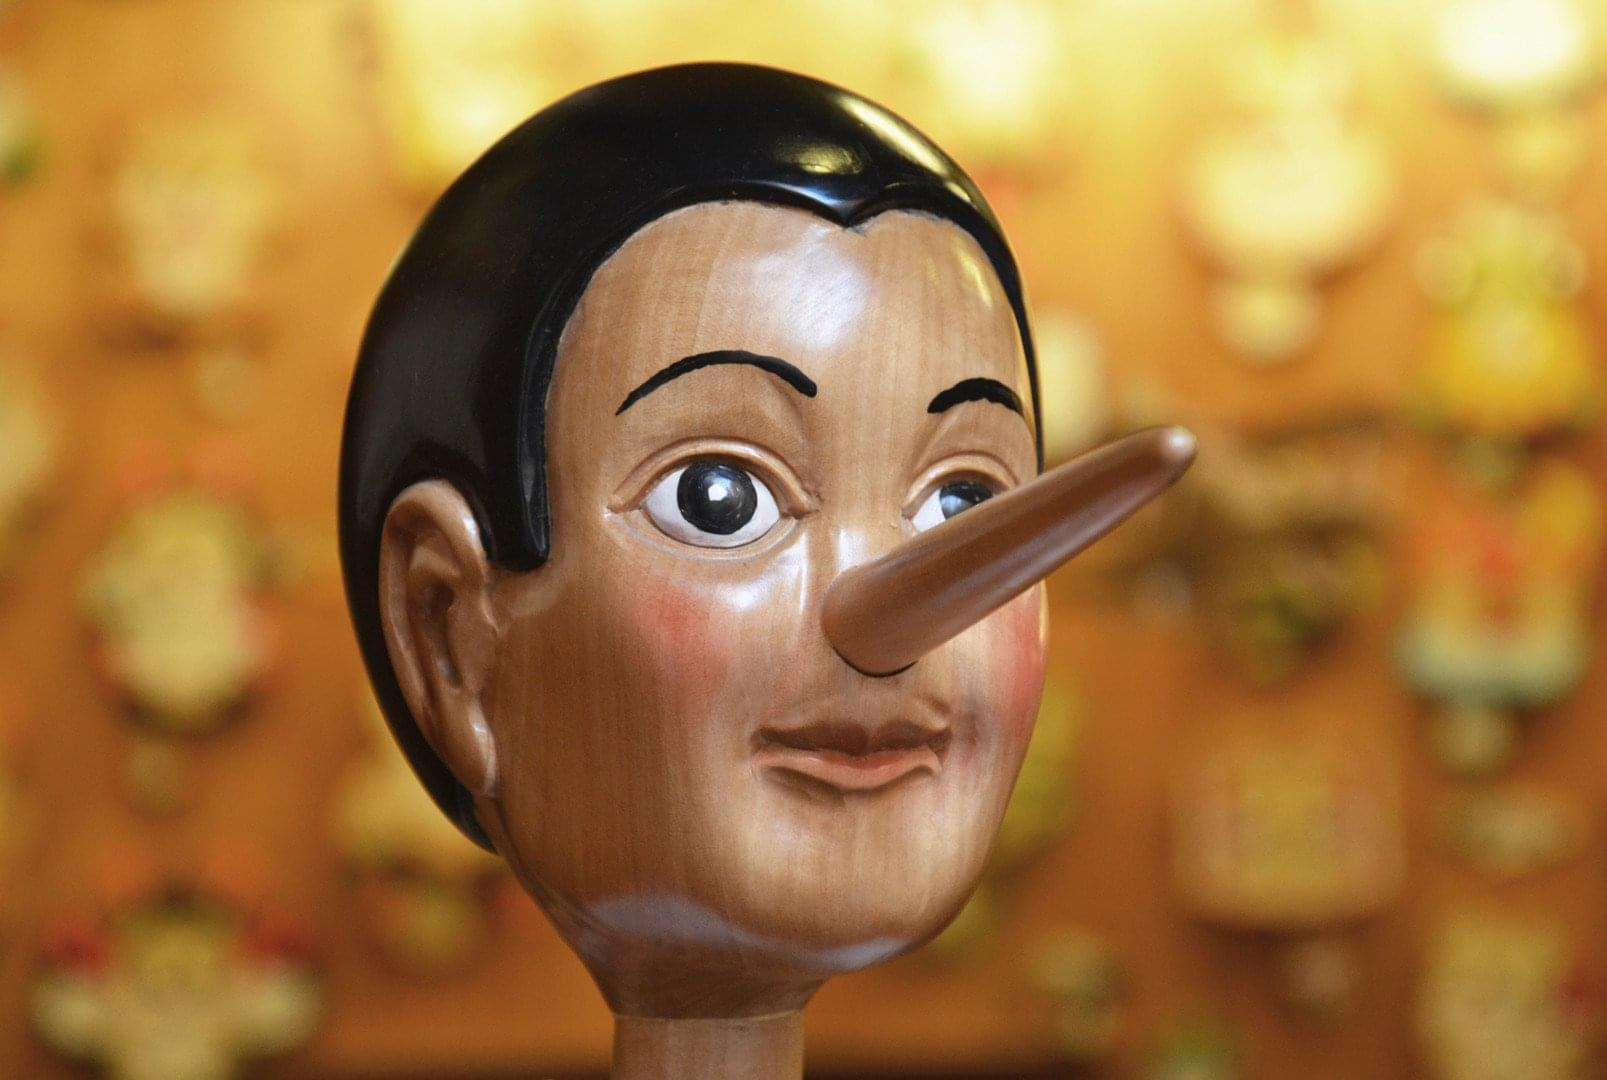 lying candidate